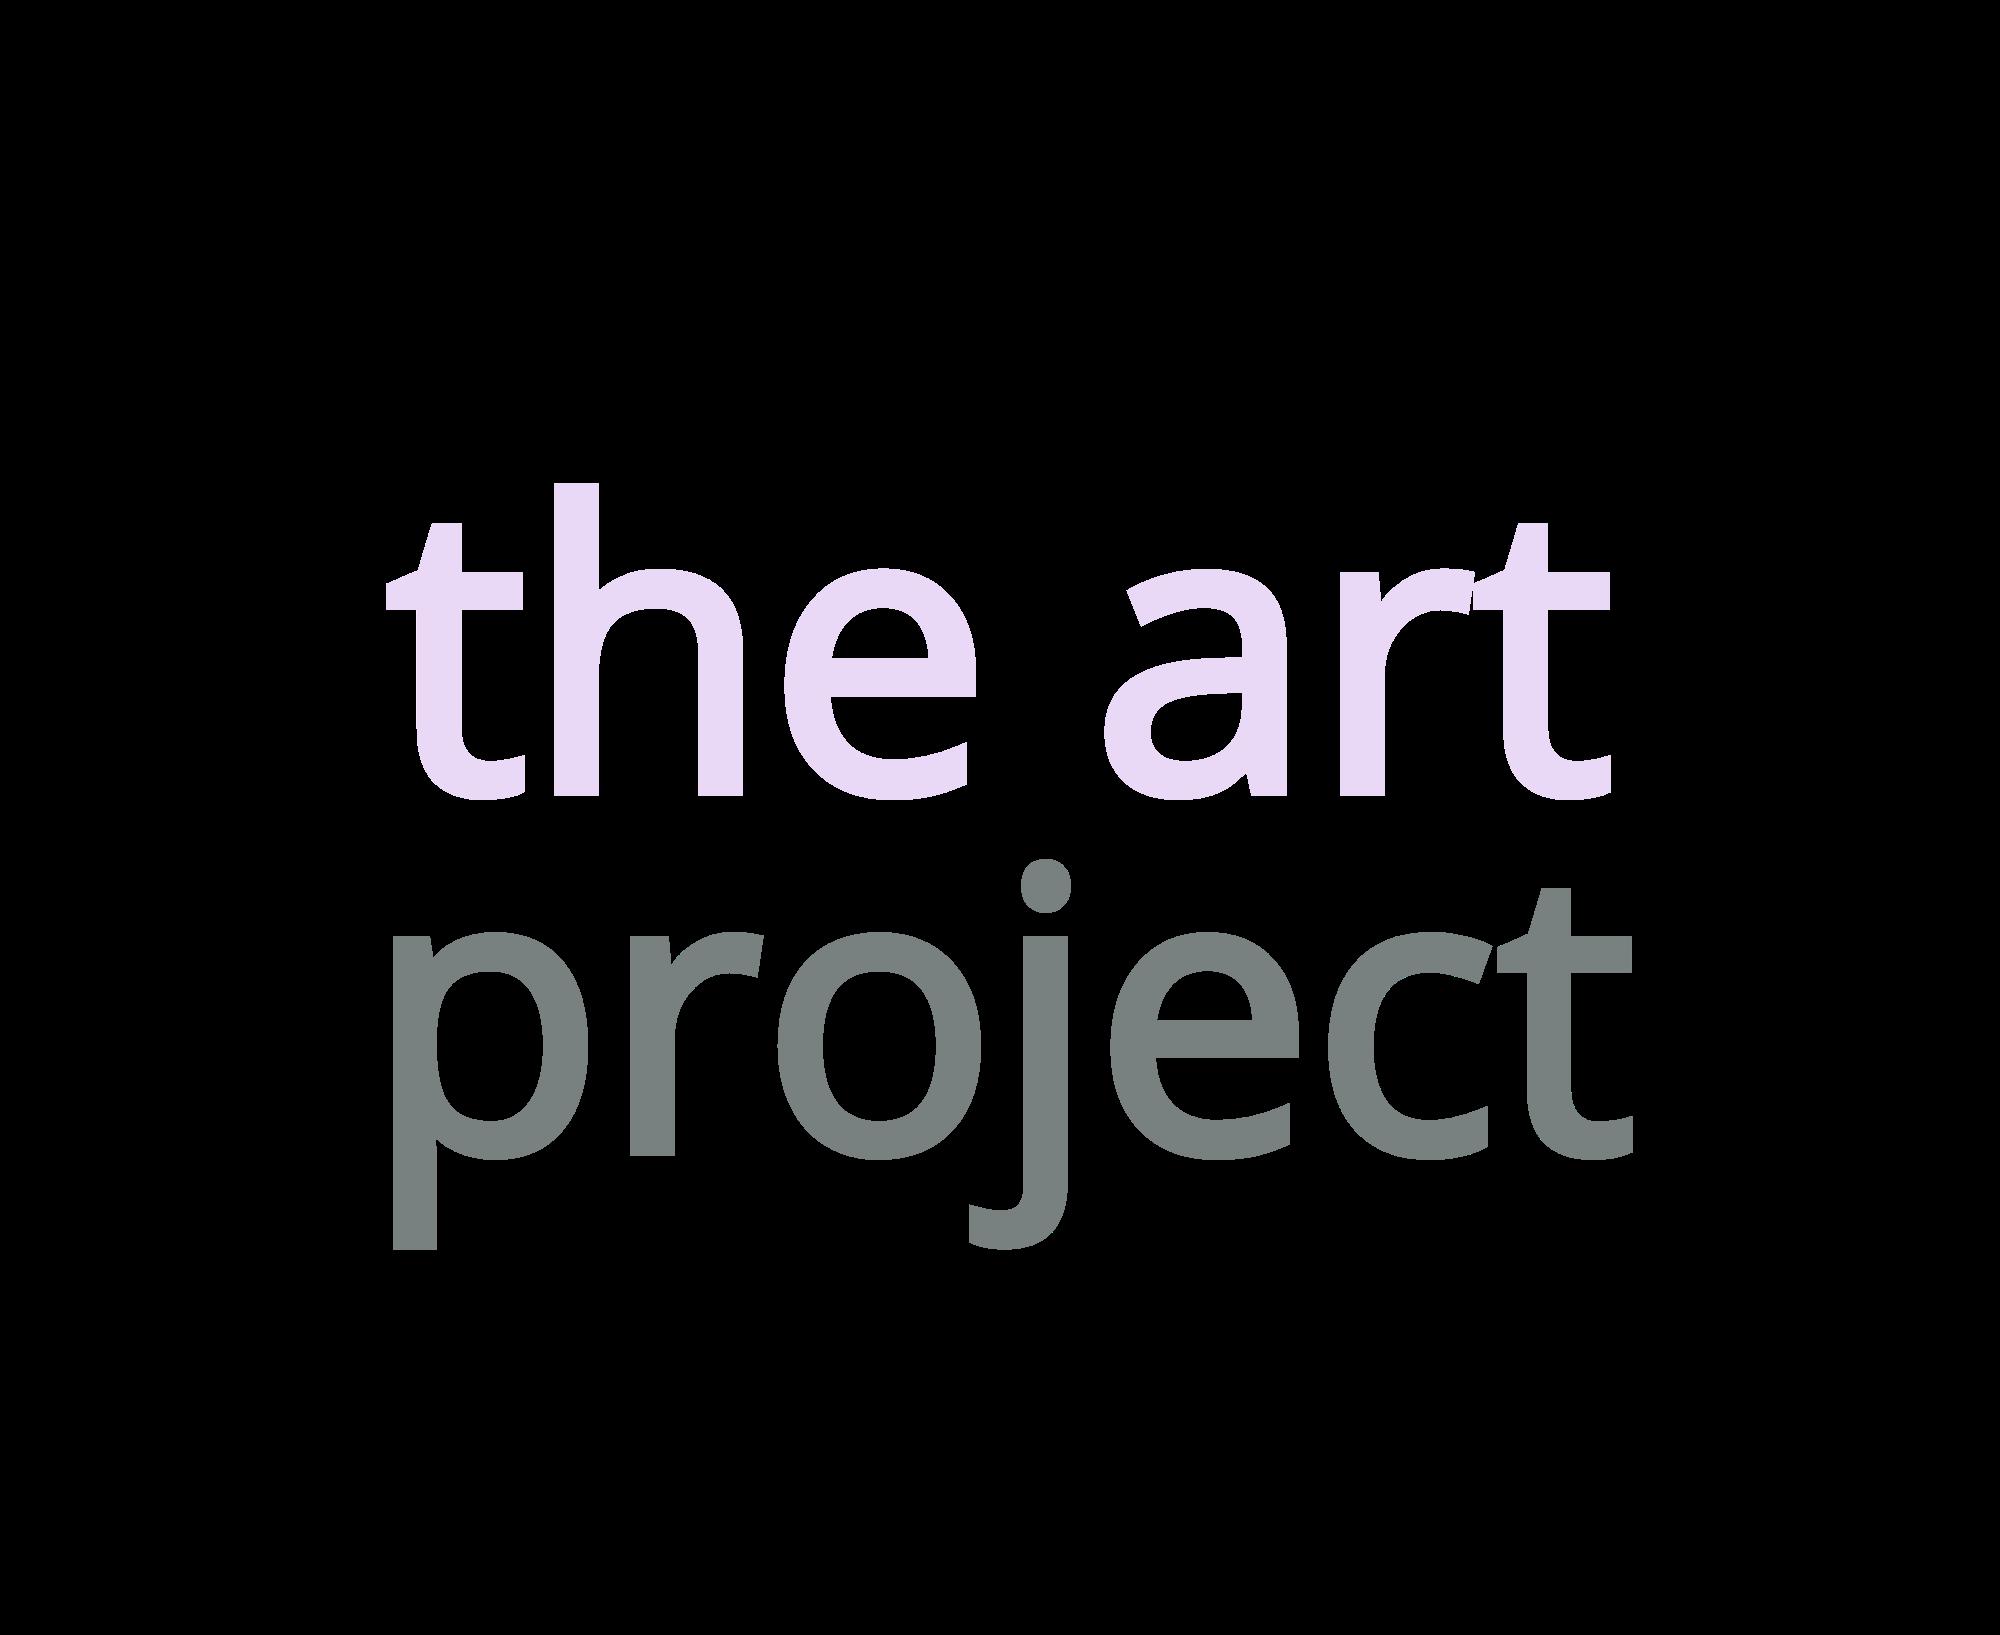 the art-logo (2).png